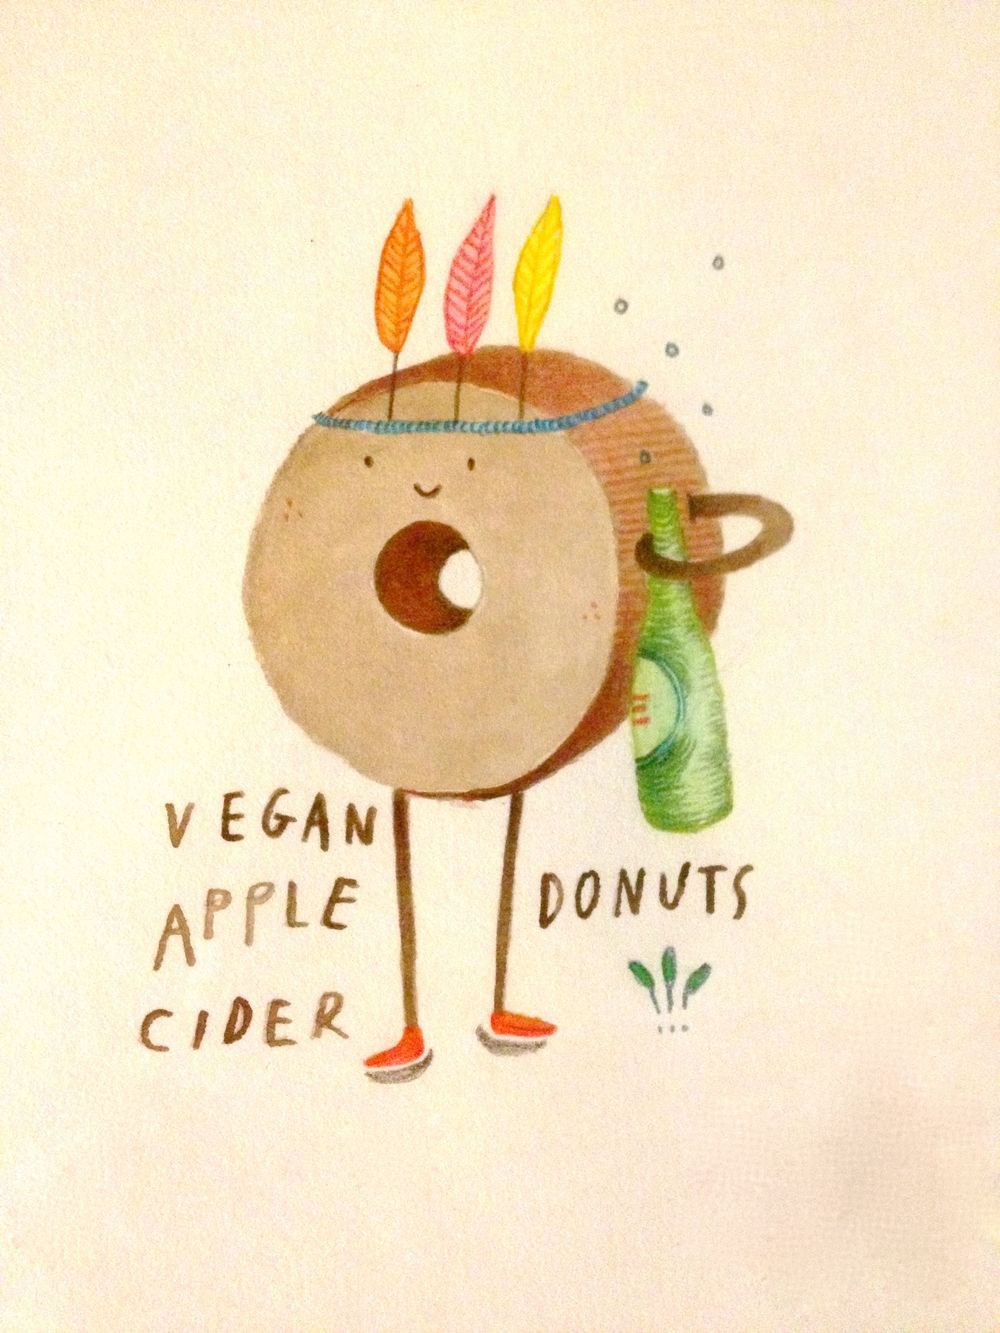 vegan donut.jpg